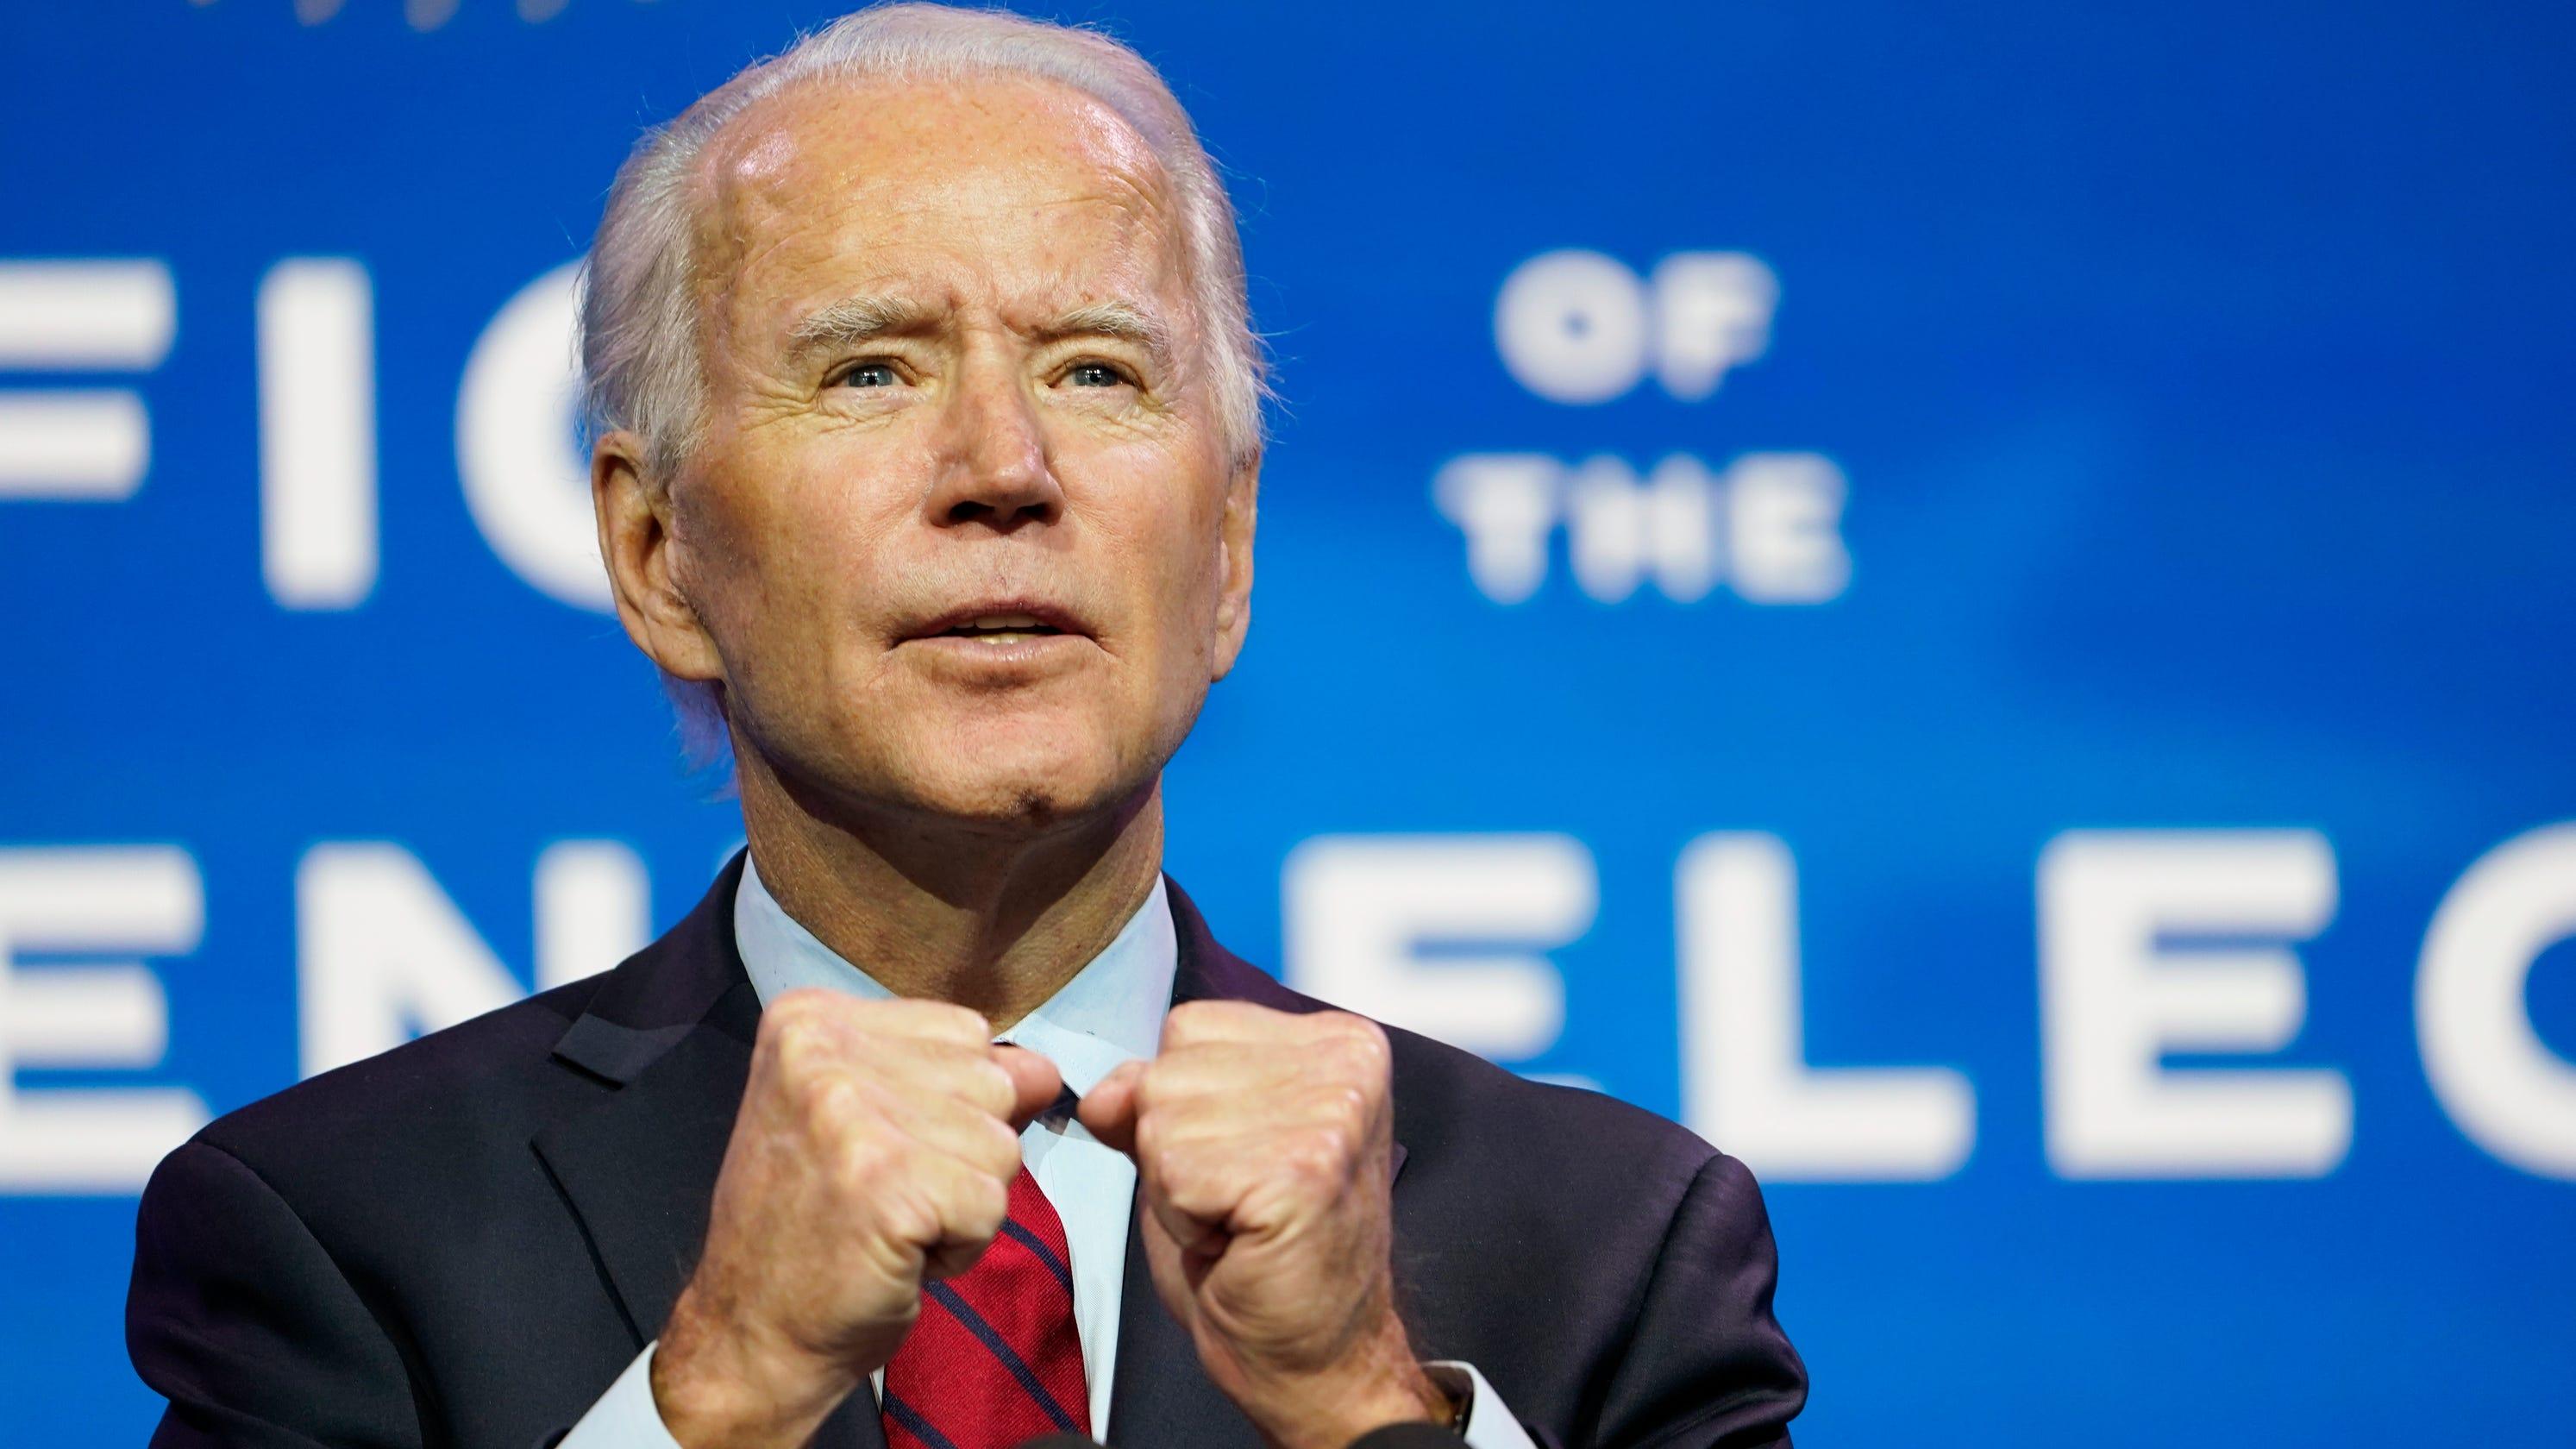 Wisconsin Supreme Court upholds Biden's win, rejects Trump lawsuit